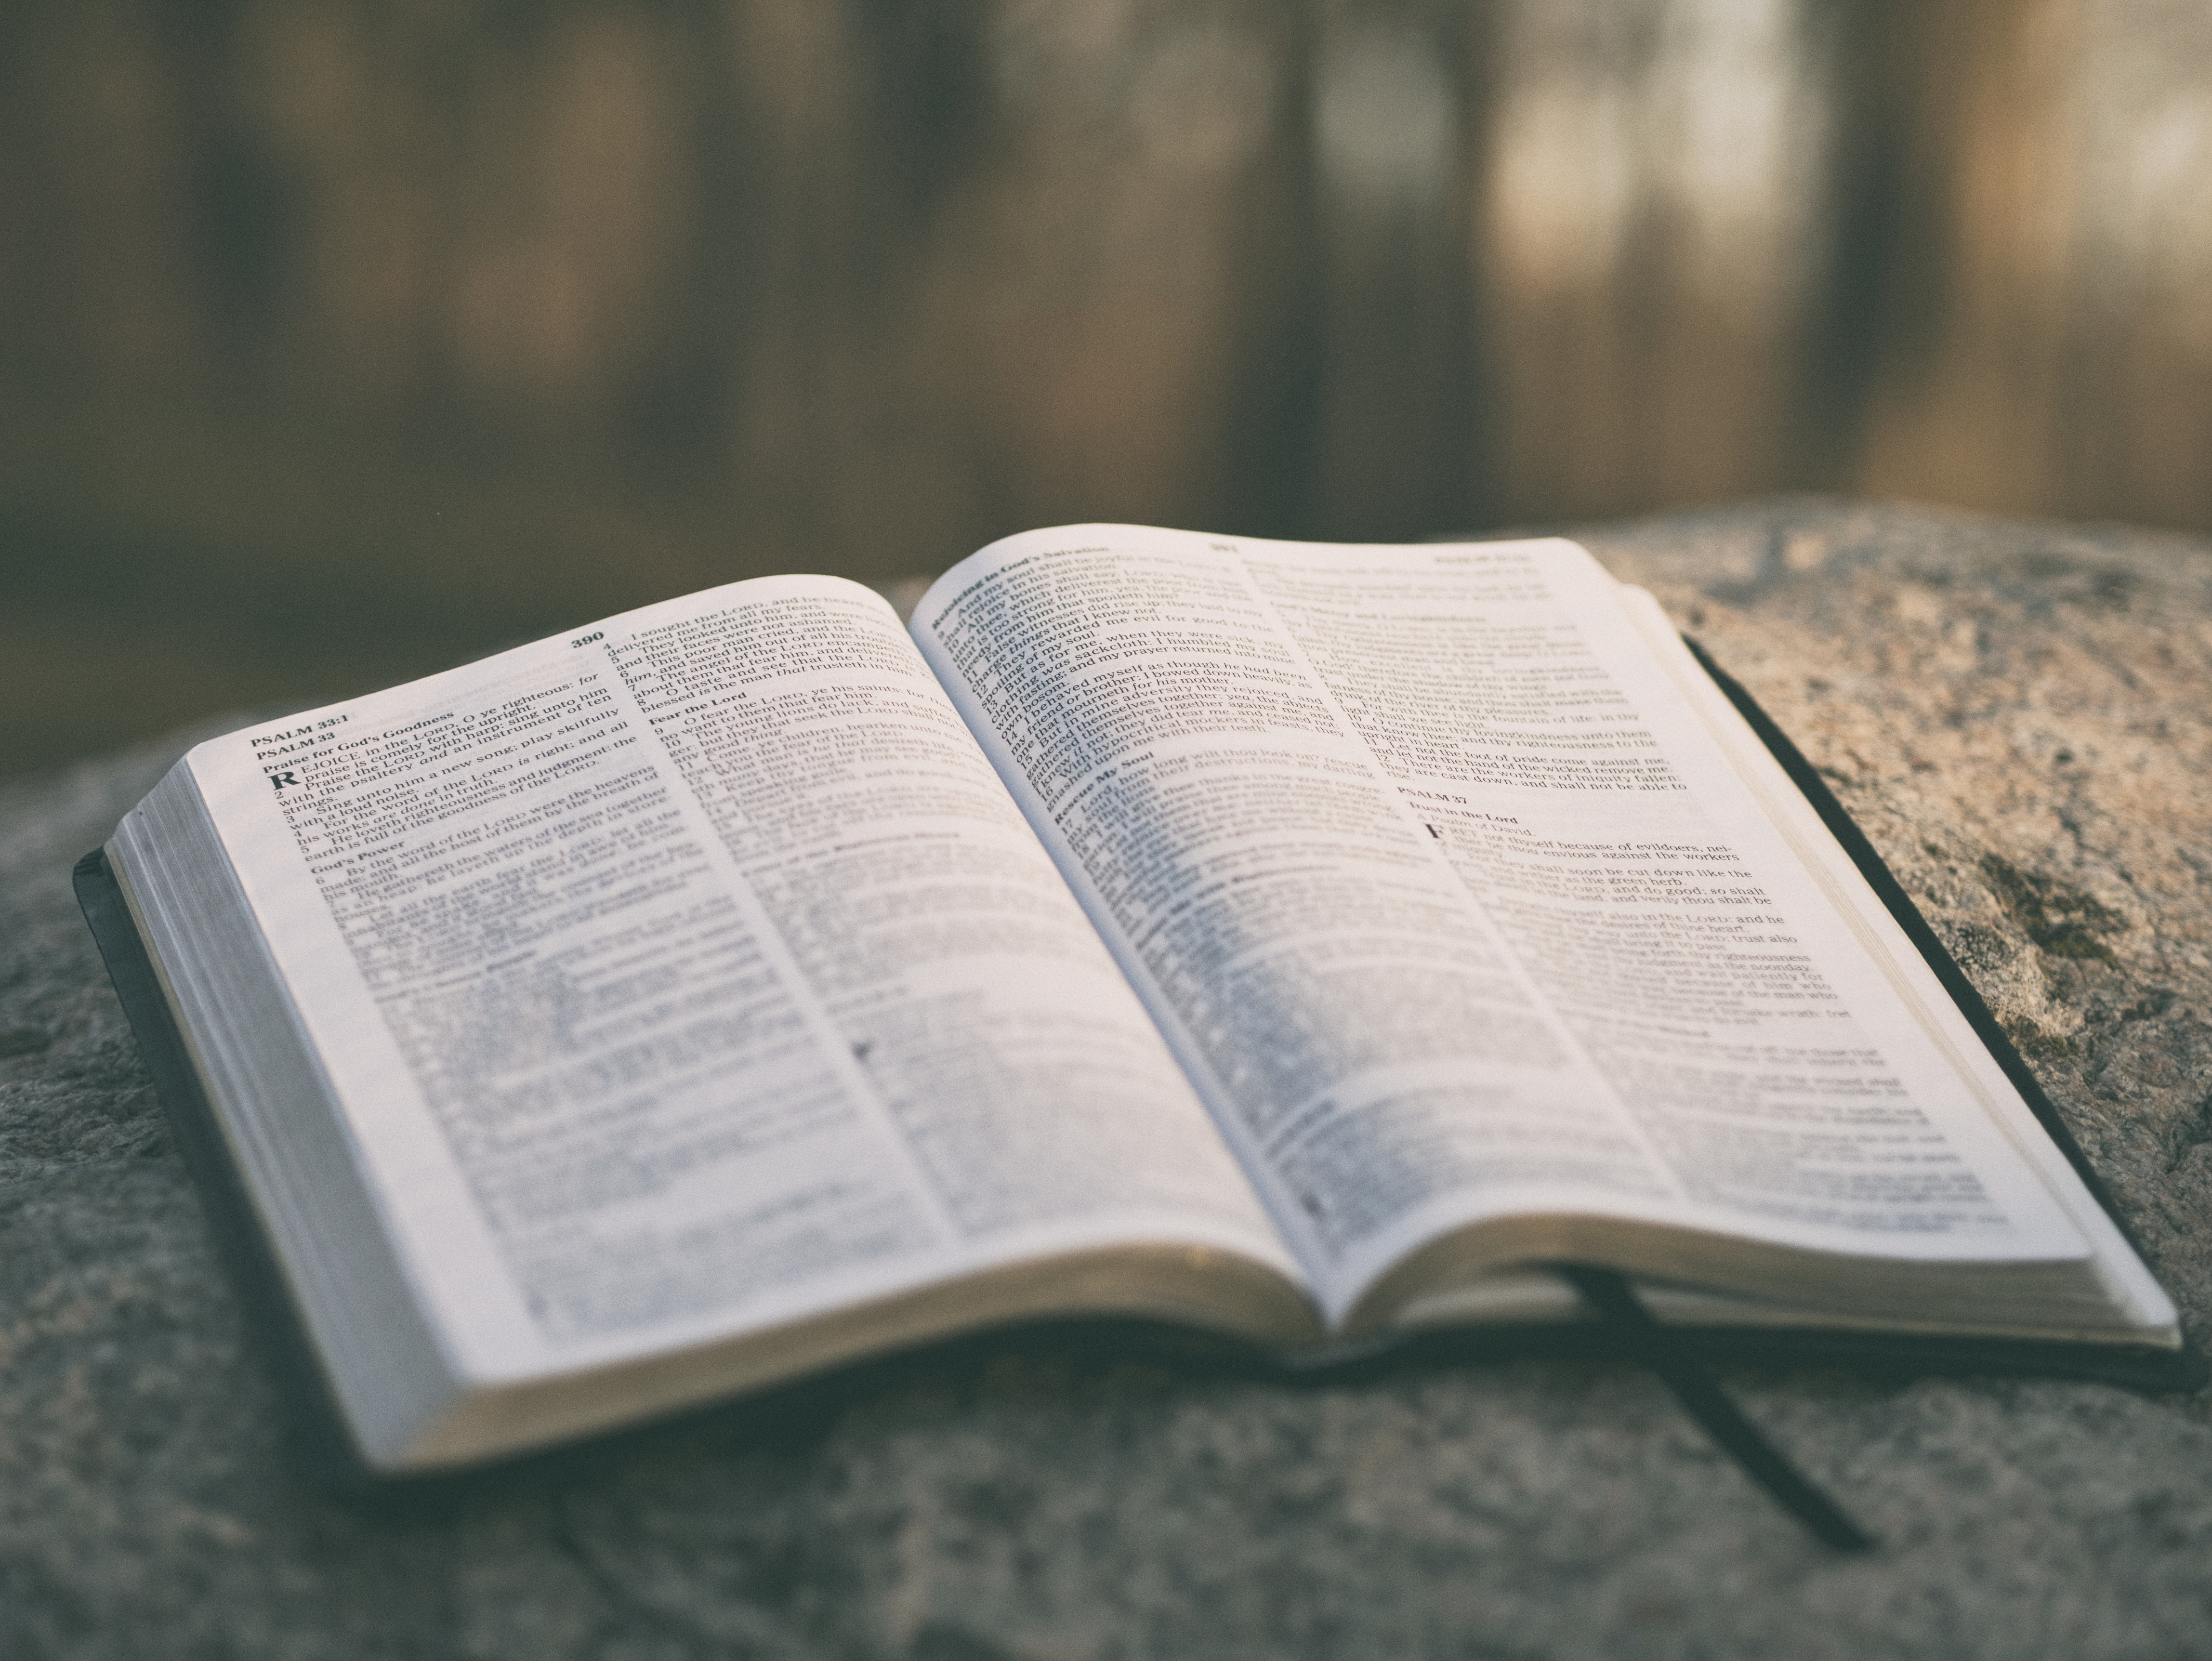 Discipleship - Growing God's Kingdom.